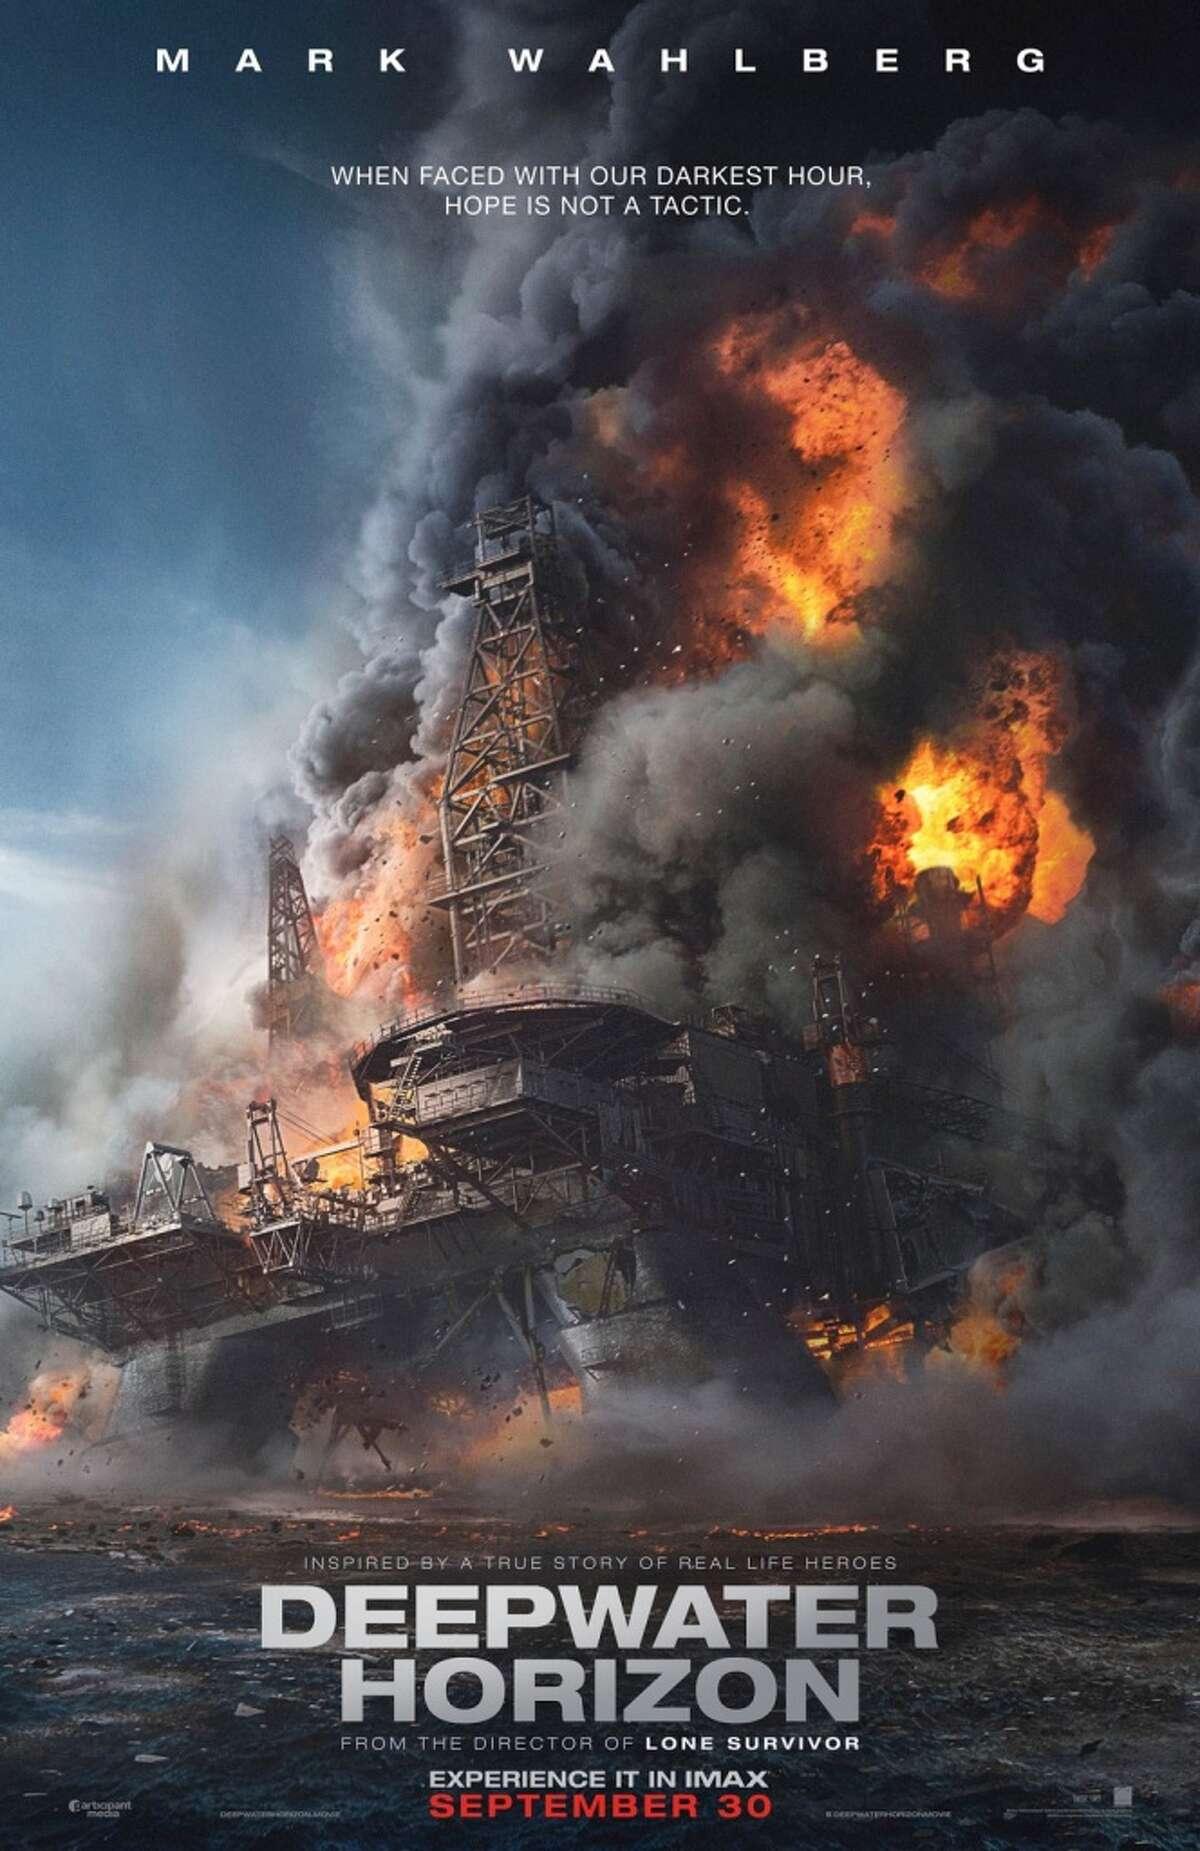 The Deepwater Horizon poster.